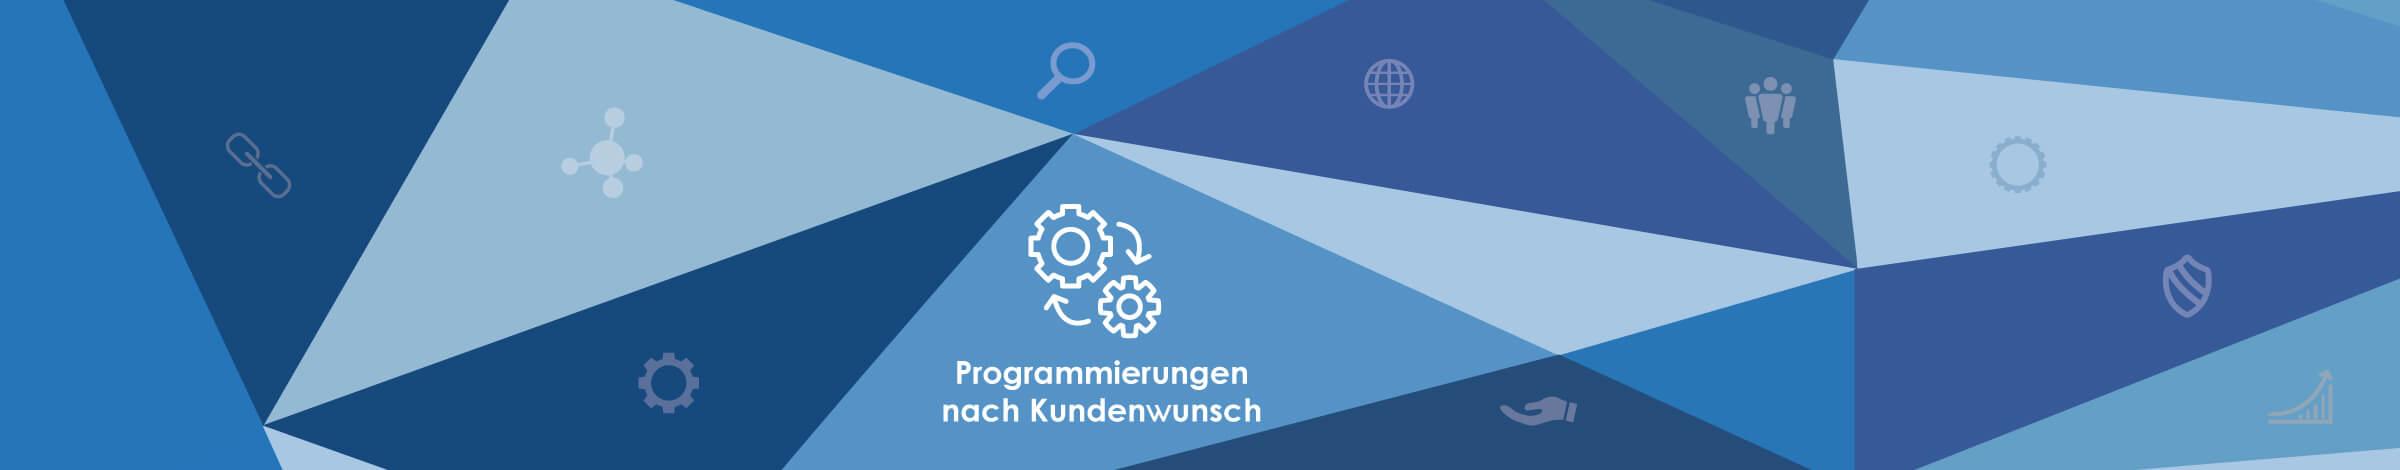 web_updates_kmu_wuk-ch_Programmierungen